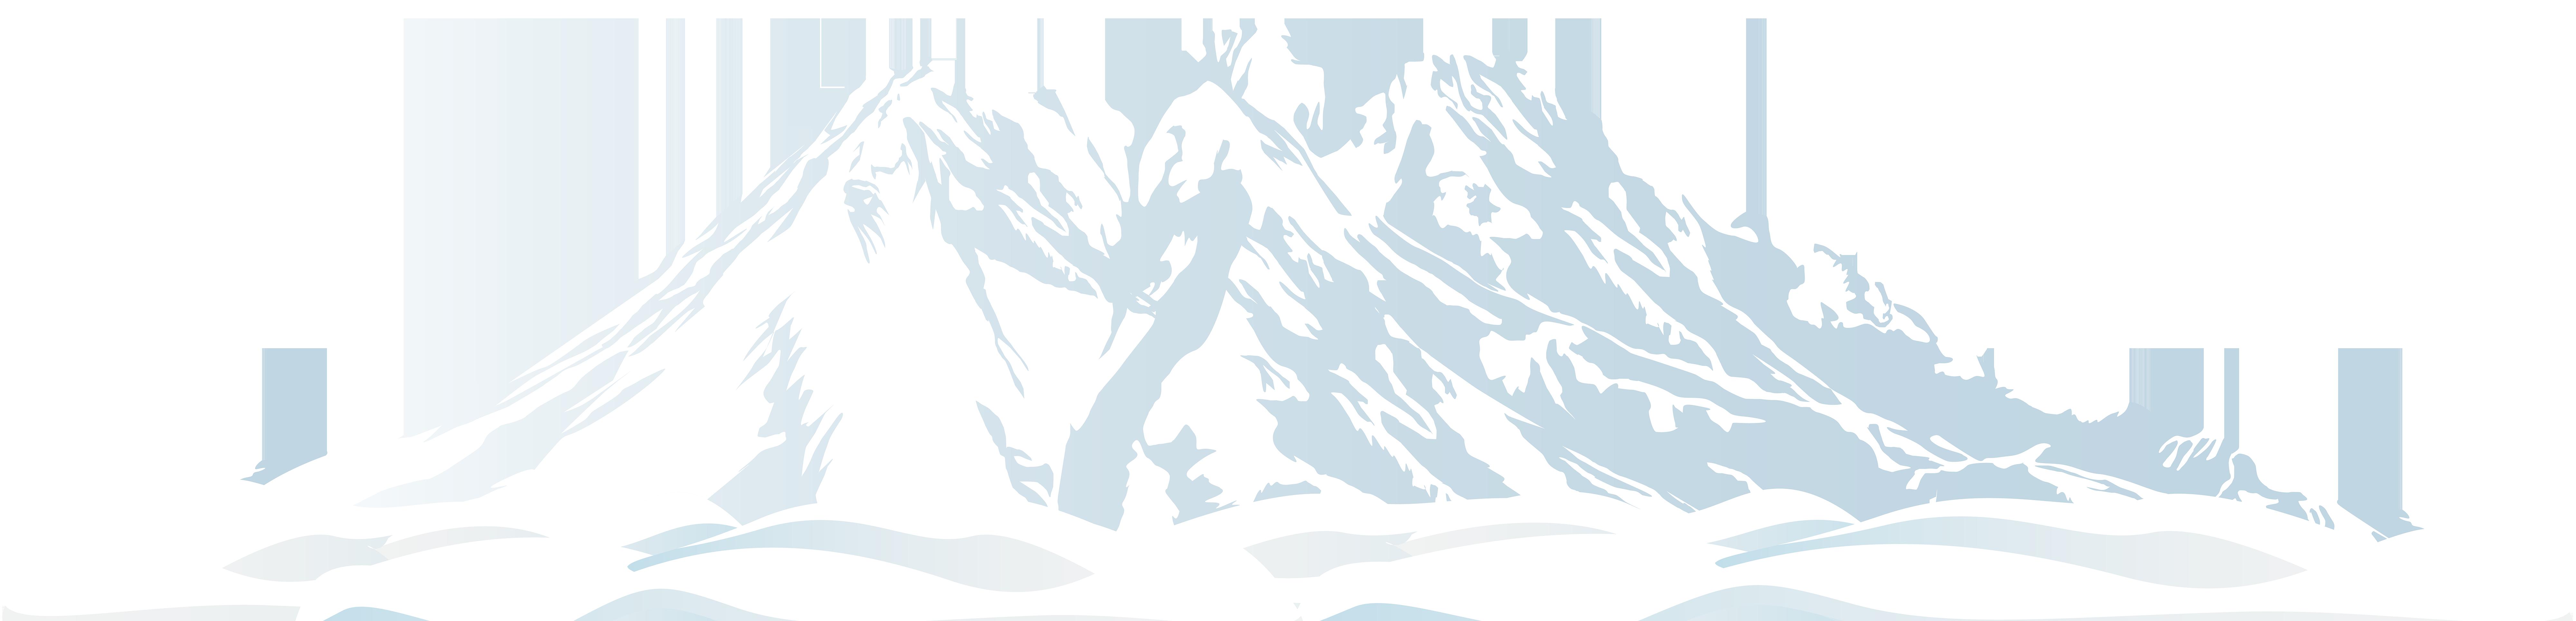 8000x1928 Winter Snowy Mountain Png Clip Art Imageu200b Gallery Yopriceville